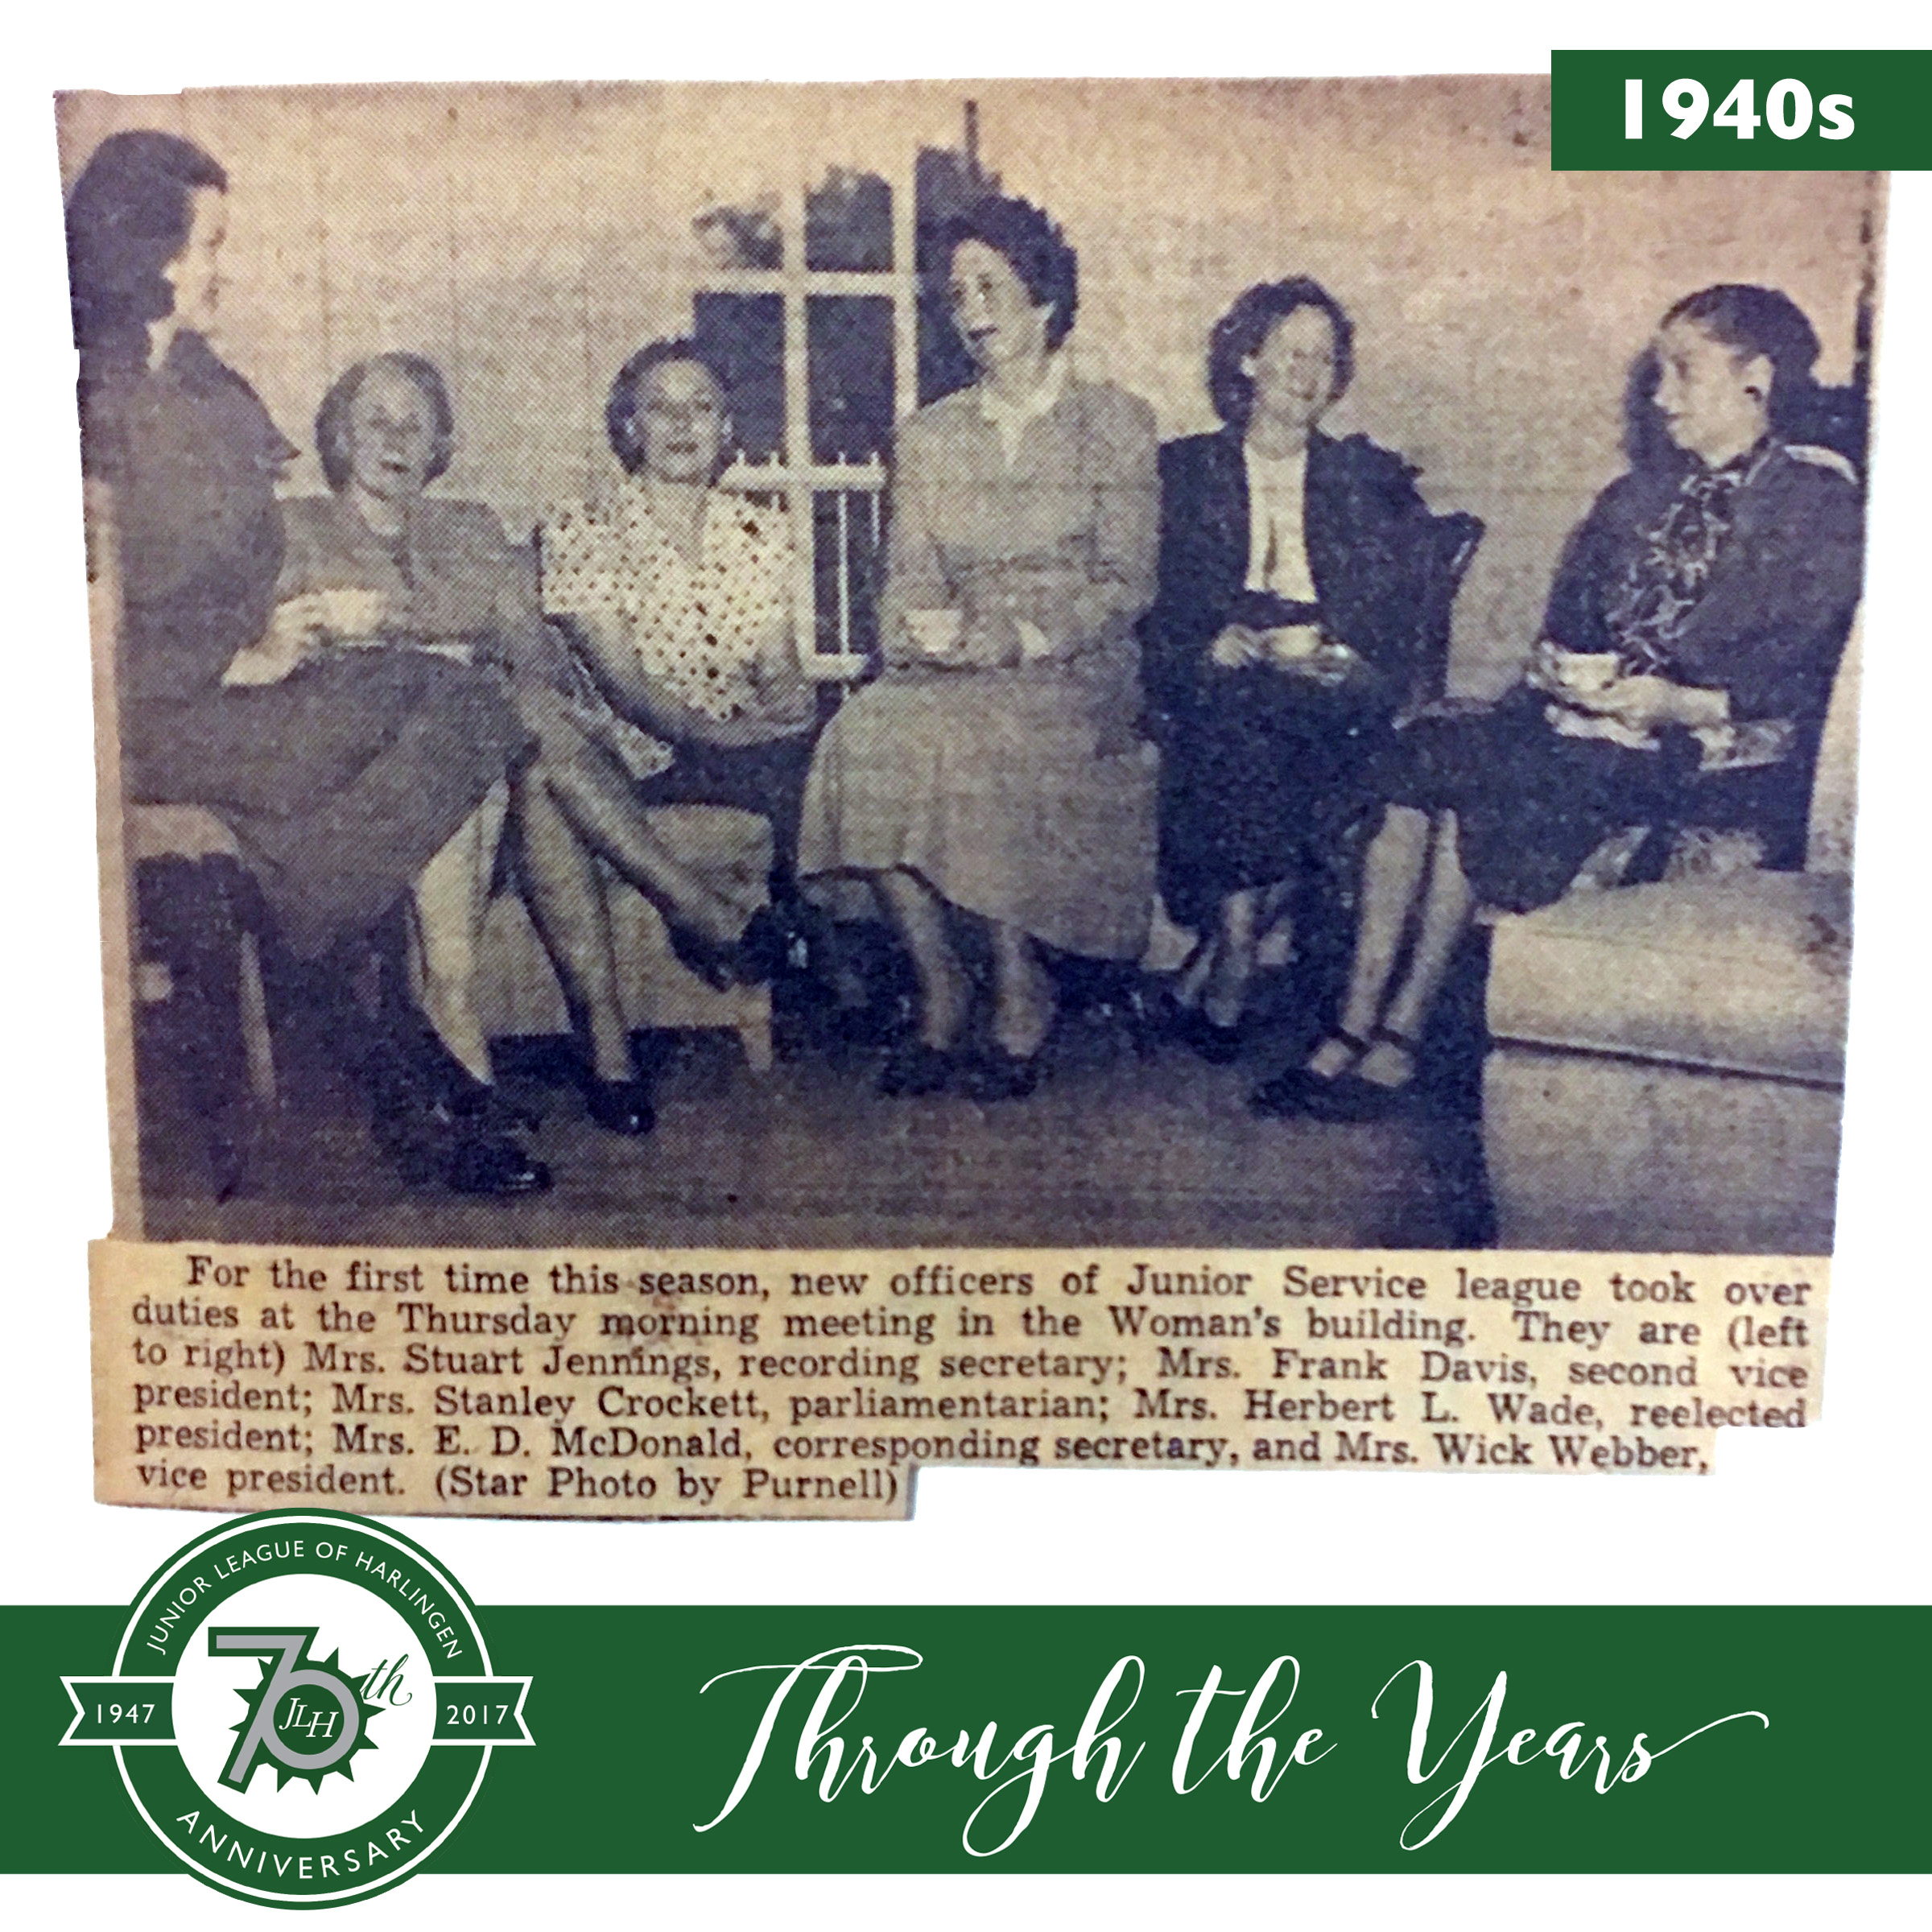 Mrs. Stuart Jennings, Mrs. Frank Davis, Mrs. Stanley Crockett, Mrs. Herbert L. Wade (our first President), Mrs. E.D. McDonald and Mr. Wick Webber